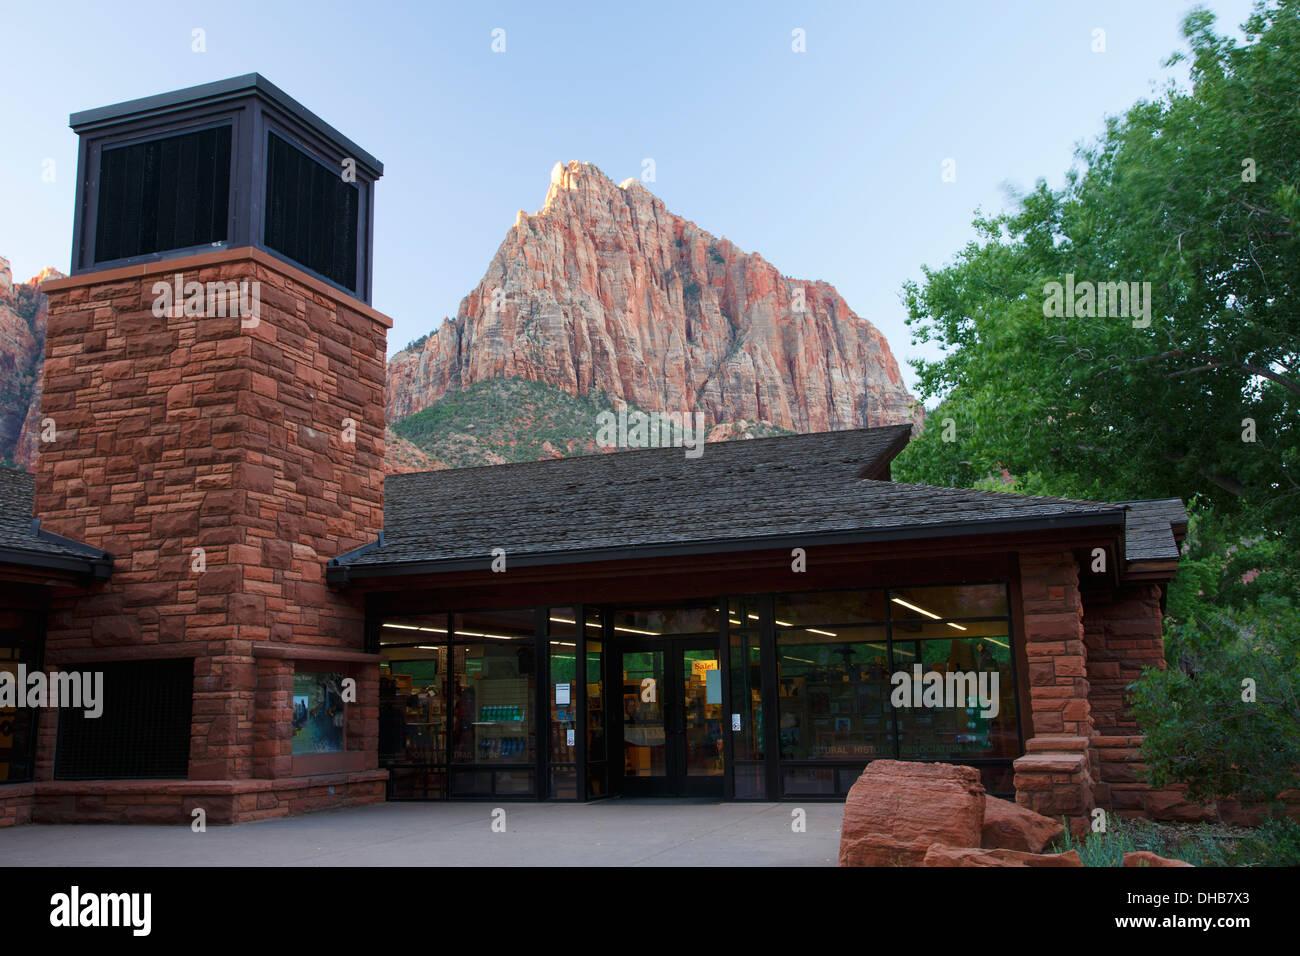 Visitor Center, Zion National Park, Utah. - Stock Image